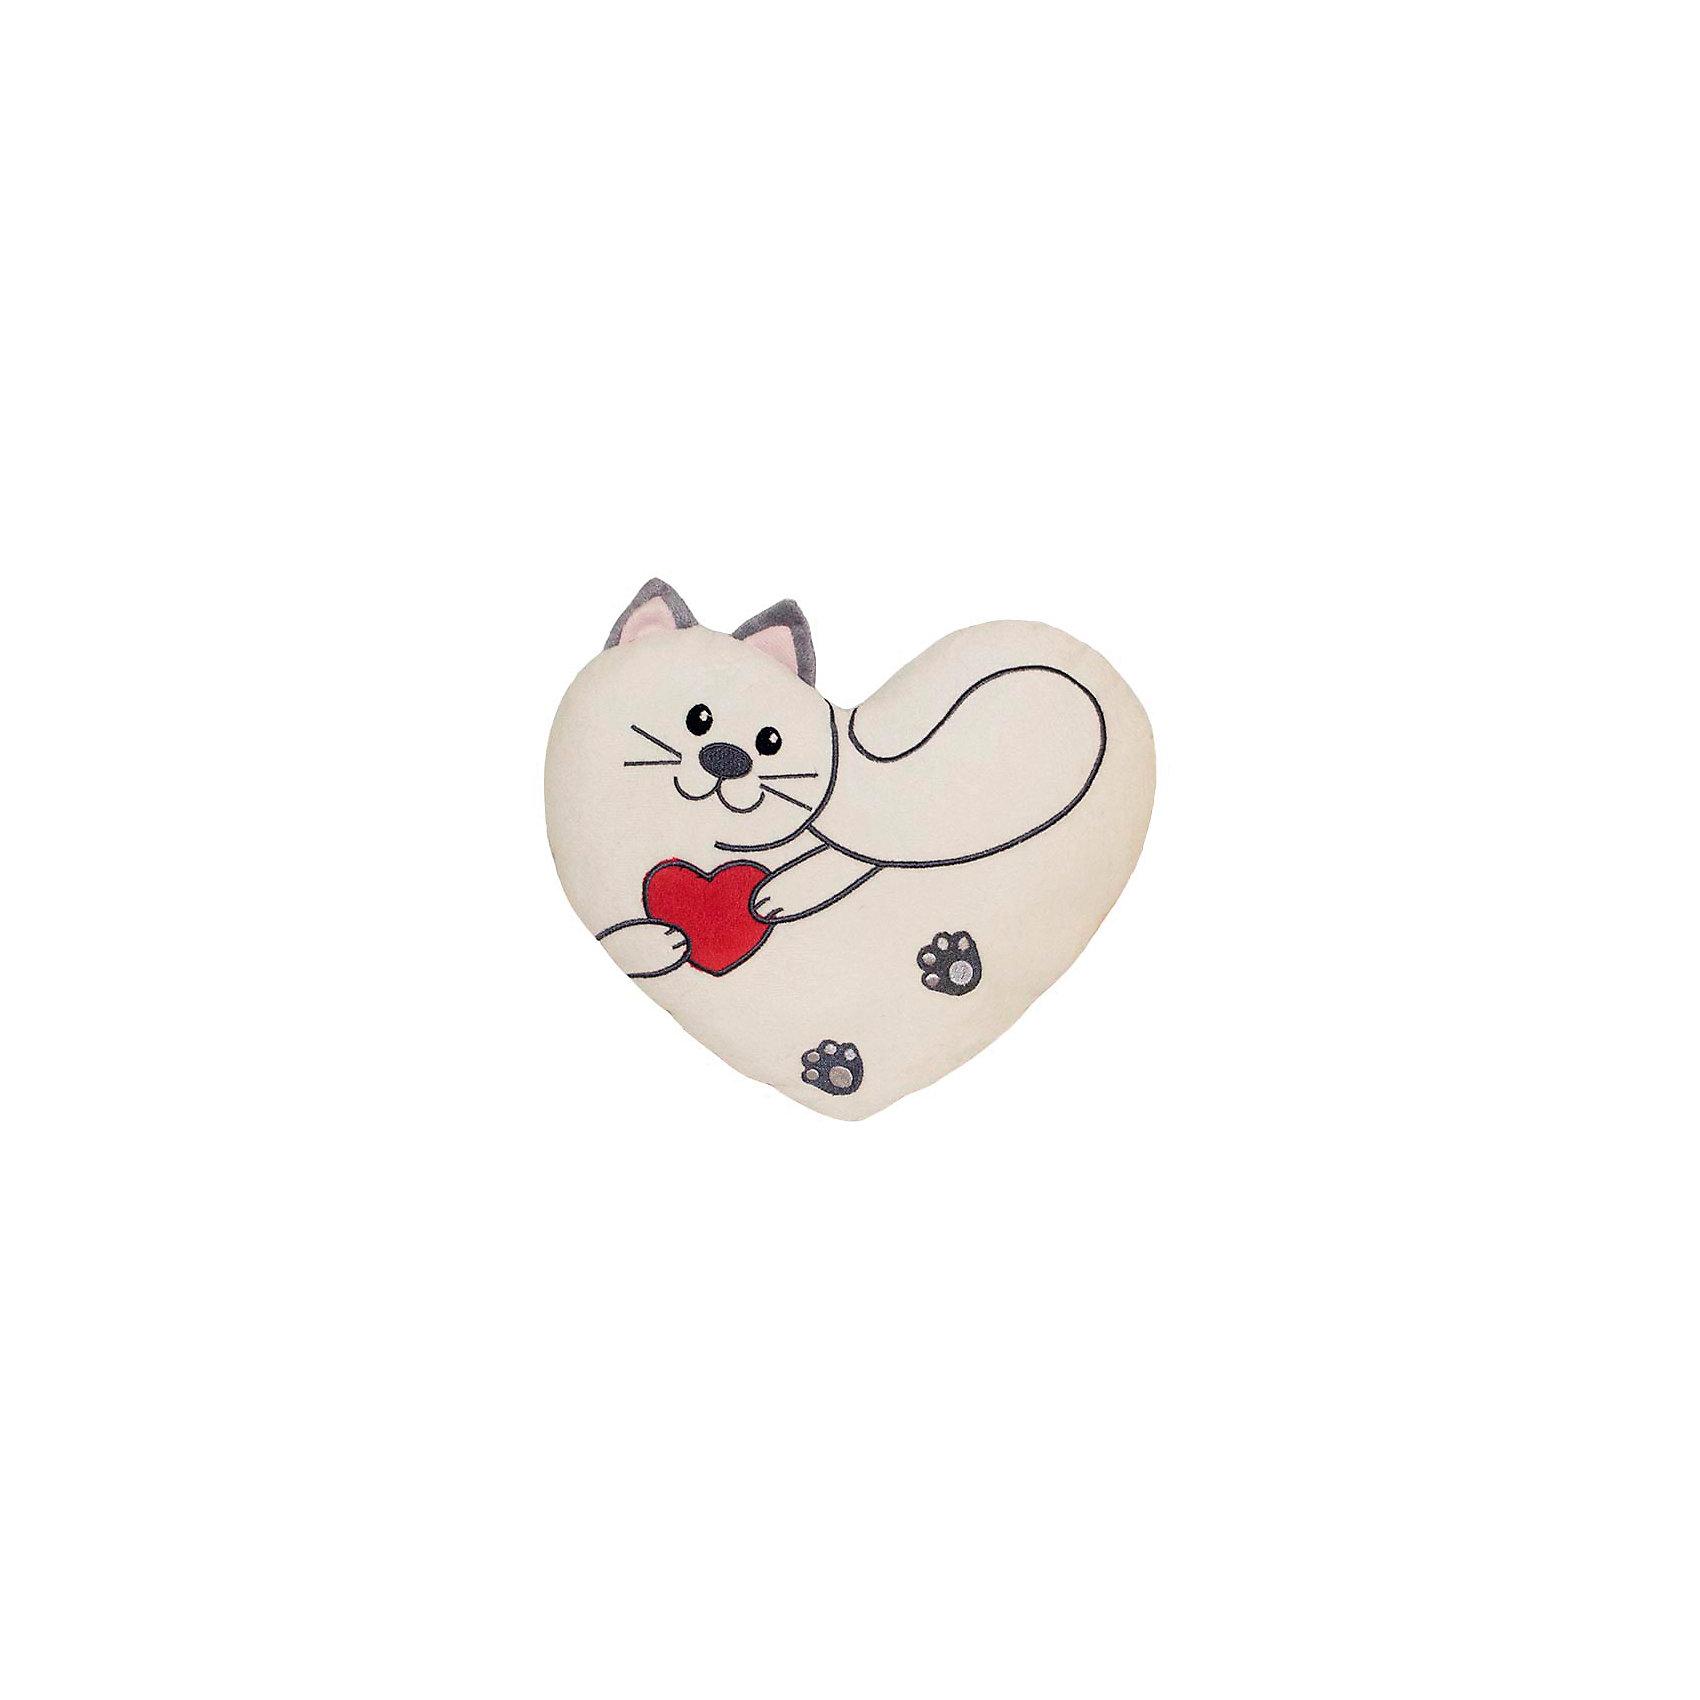 Подушка-валентинка Снежок 25 см, Gulliver